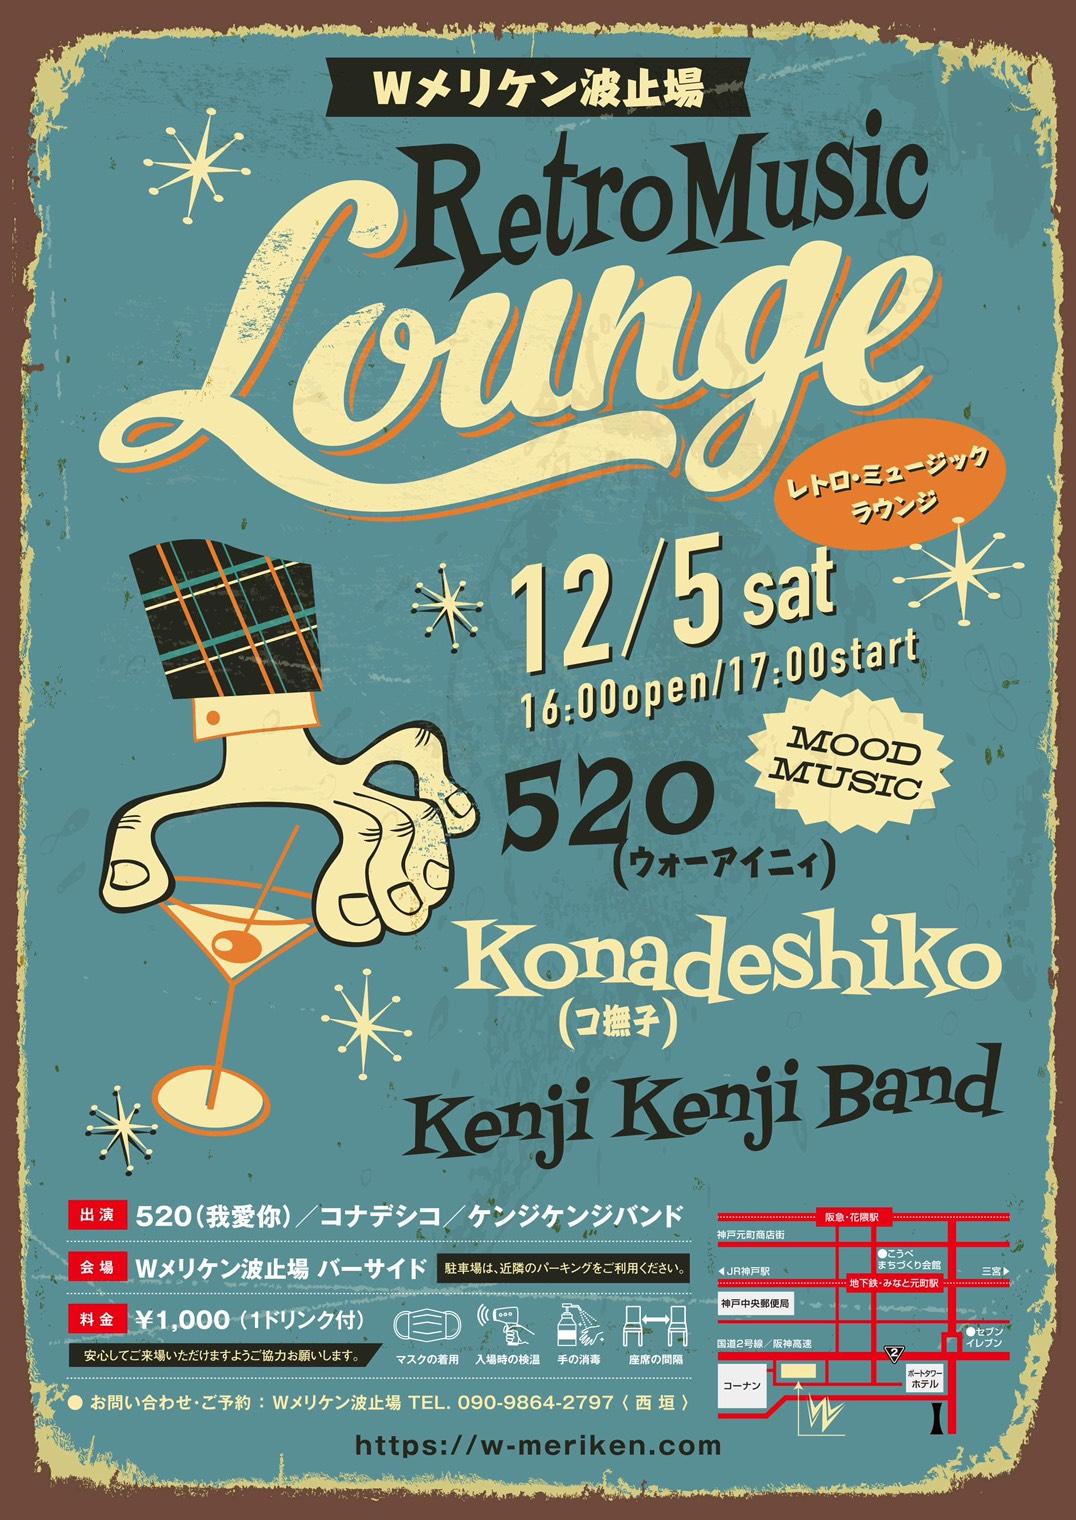 Wメリケン波止場 Retro Music Lounge